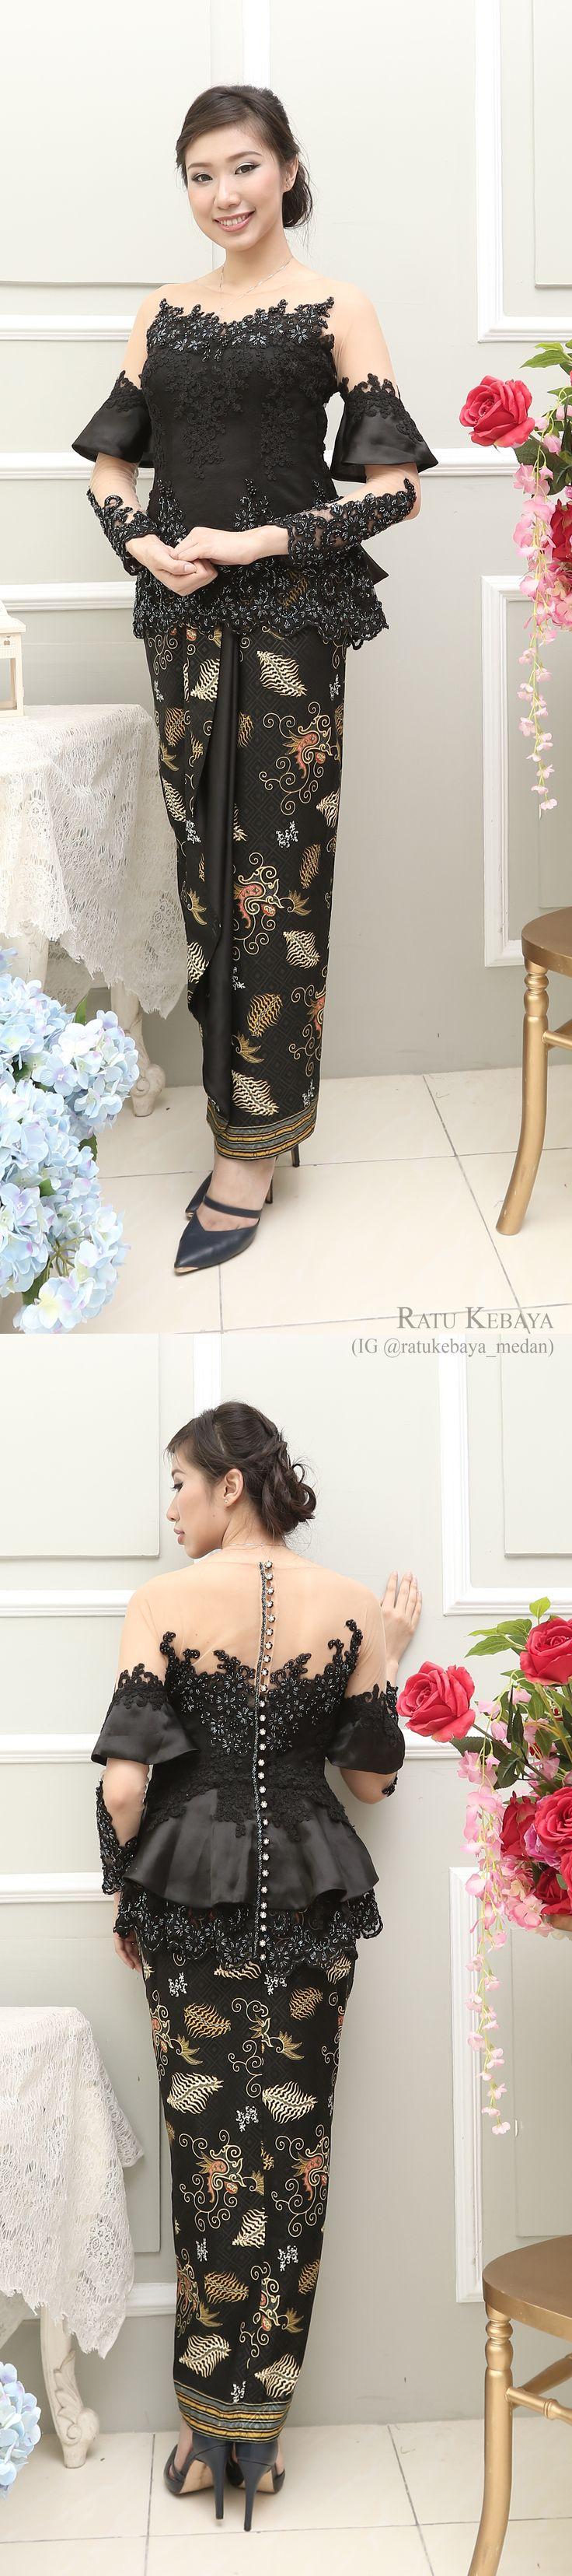 Inspirasi kebaya @ratukebaya_medan. Padanan lace dan batik.